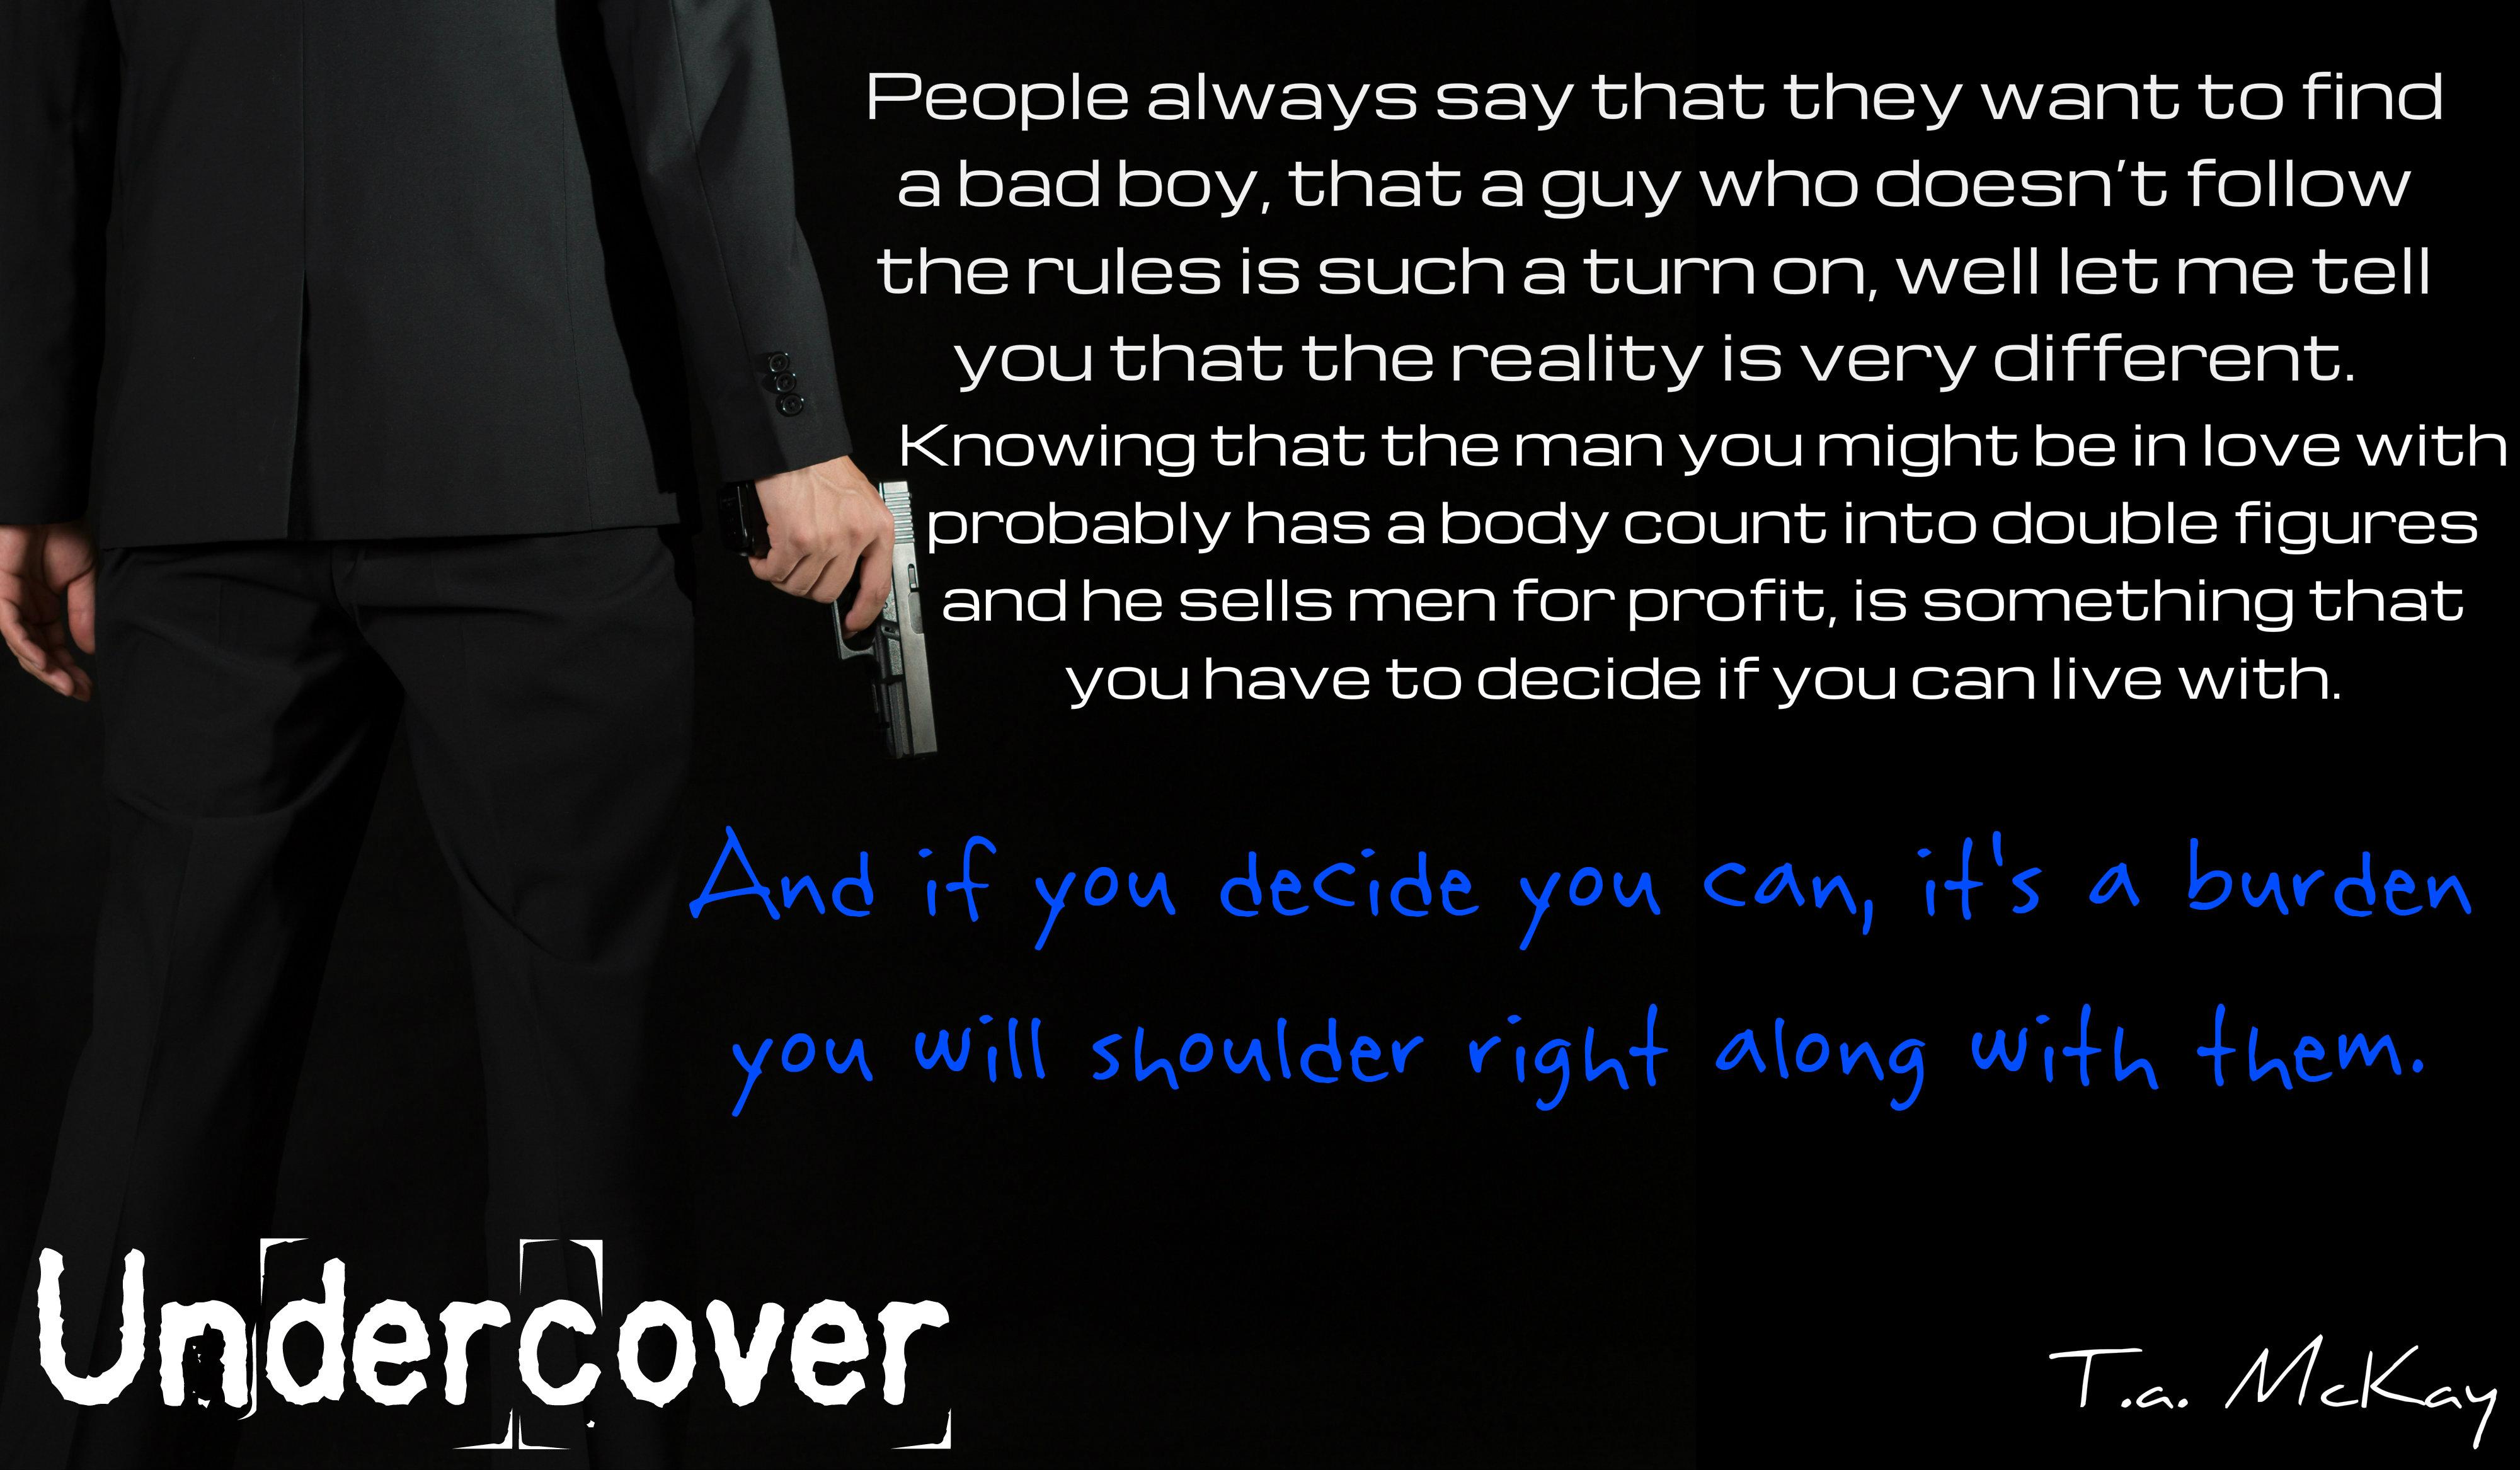 Undercovercriminal